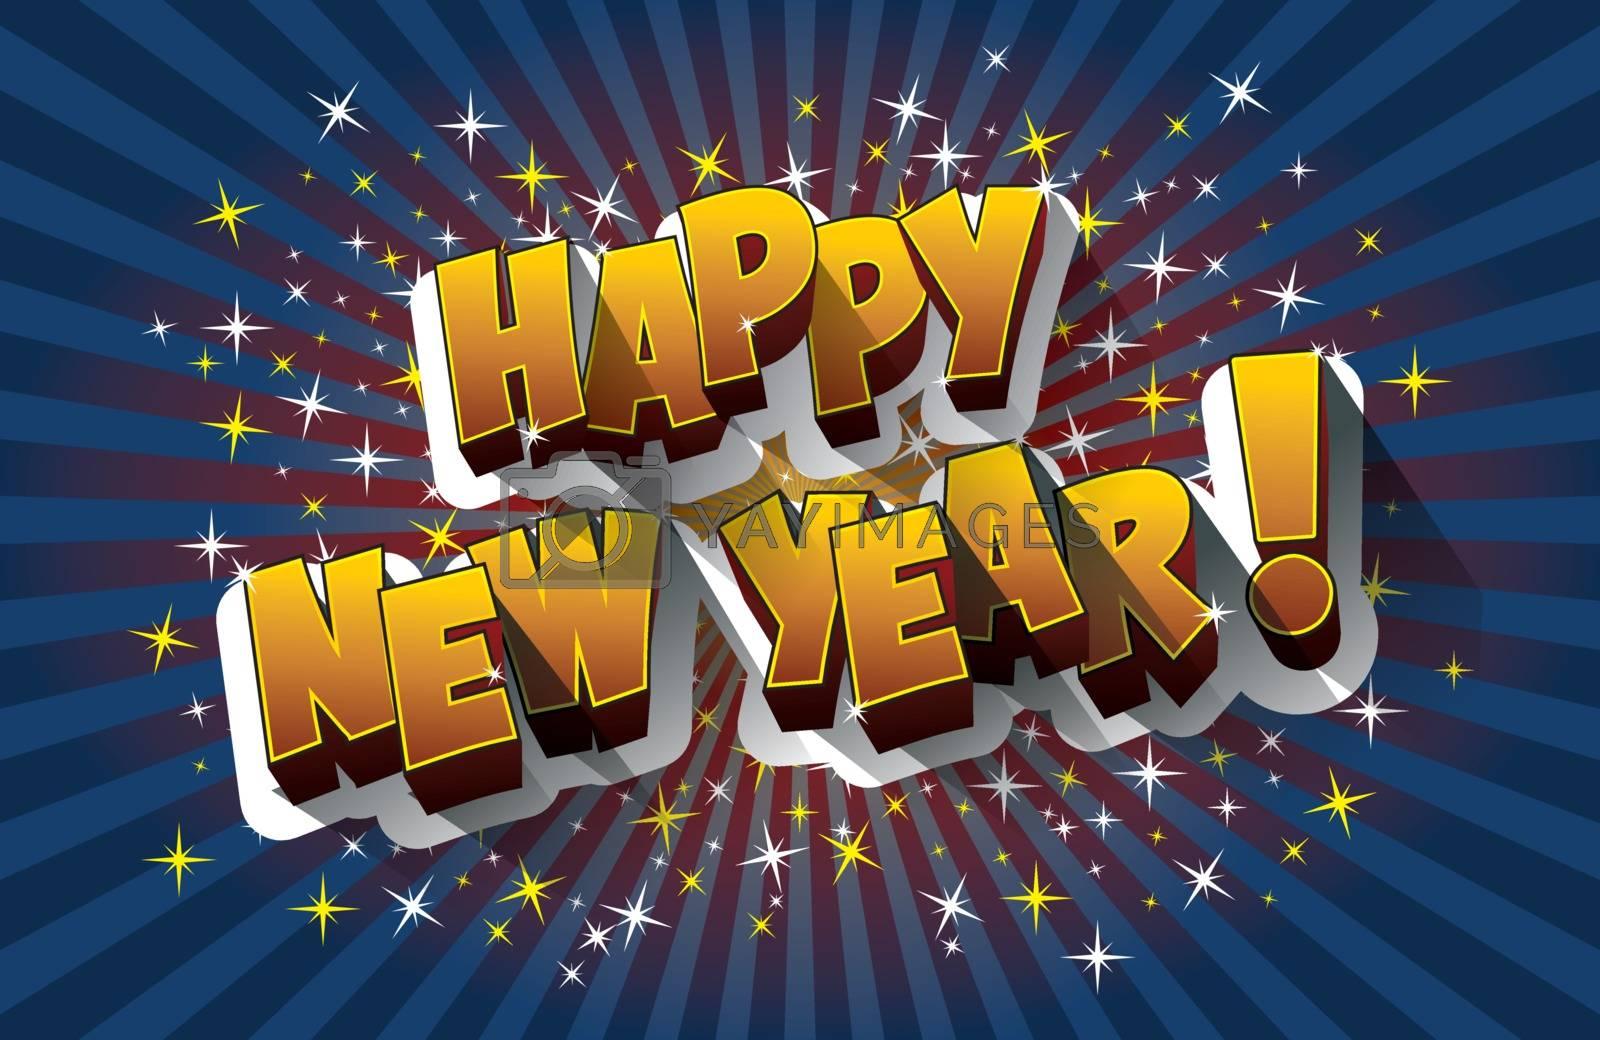 Happy new year 2016 celebration greeting card design